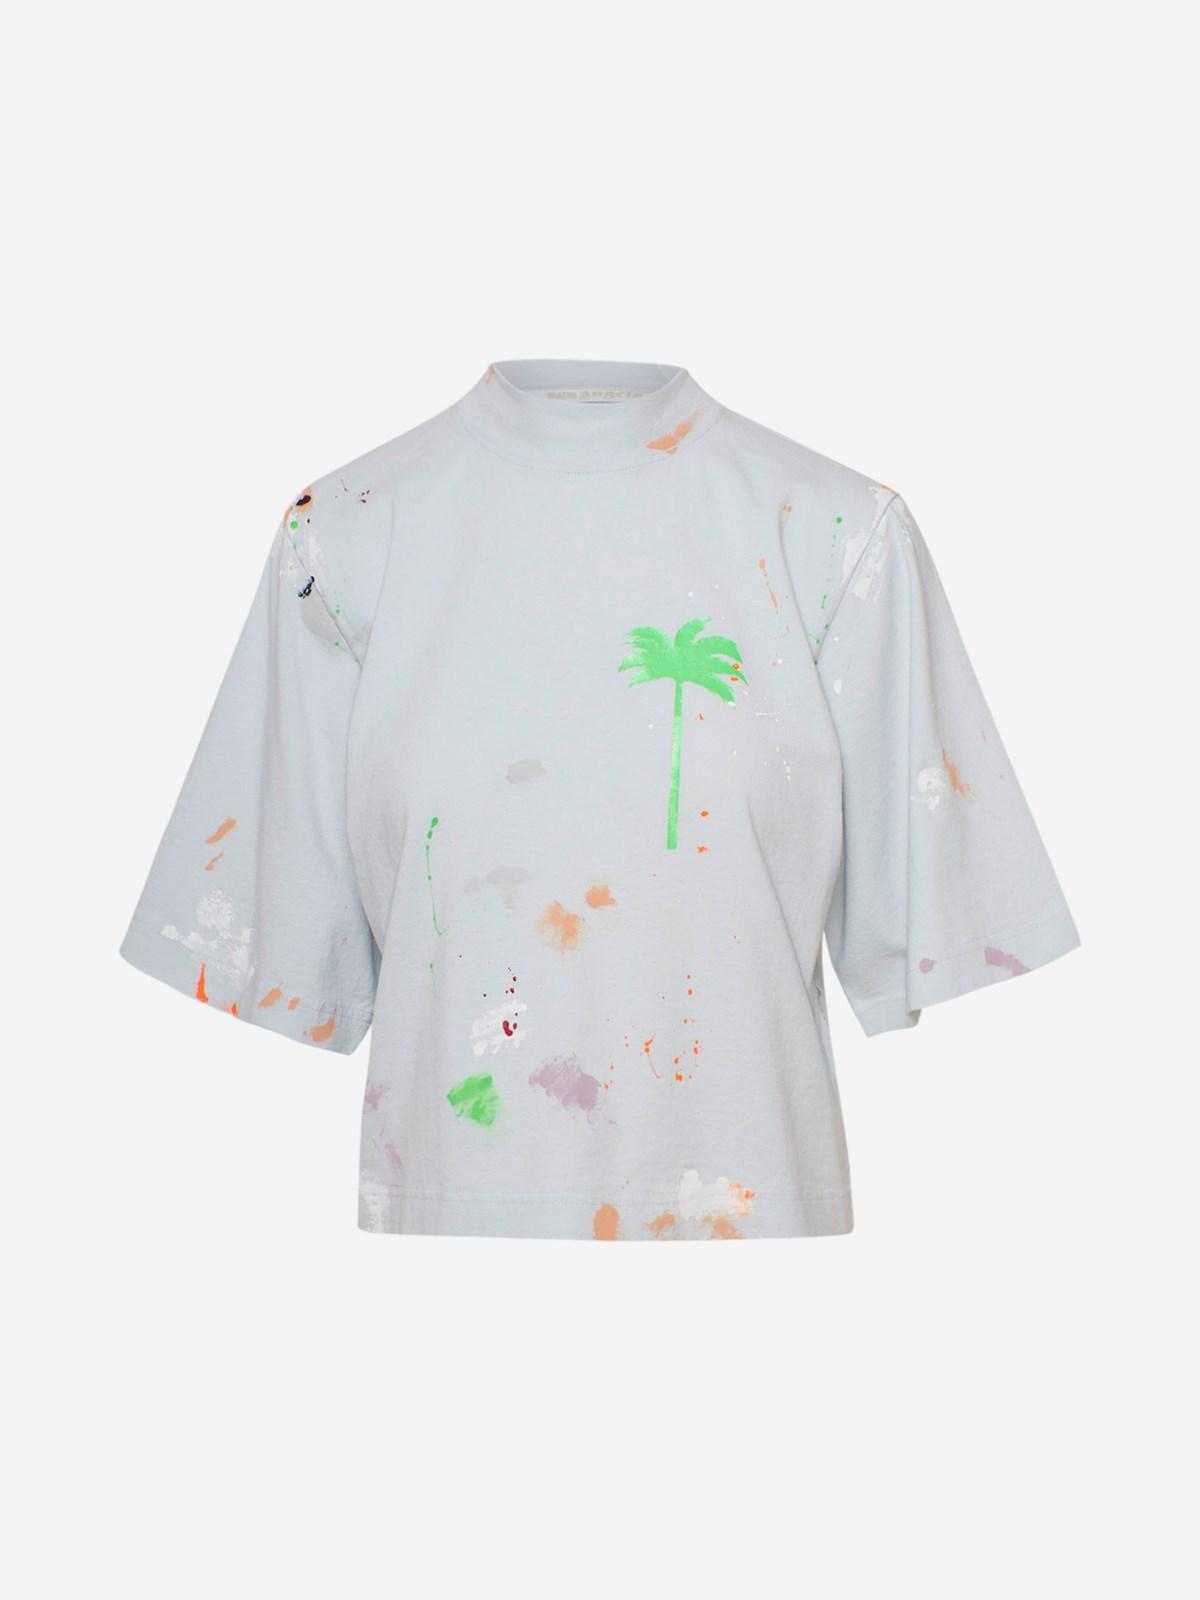 Palm Angels T-shirts LIGHT BLUE PXP T-SHIRT